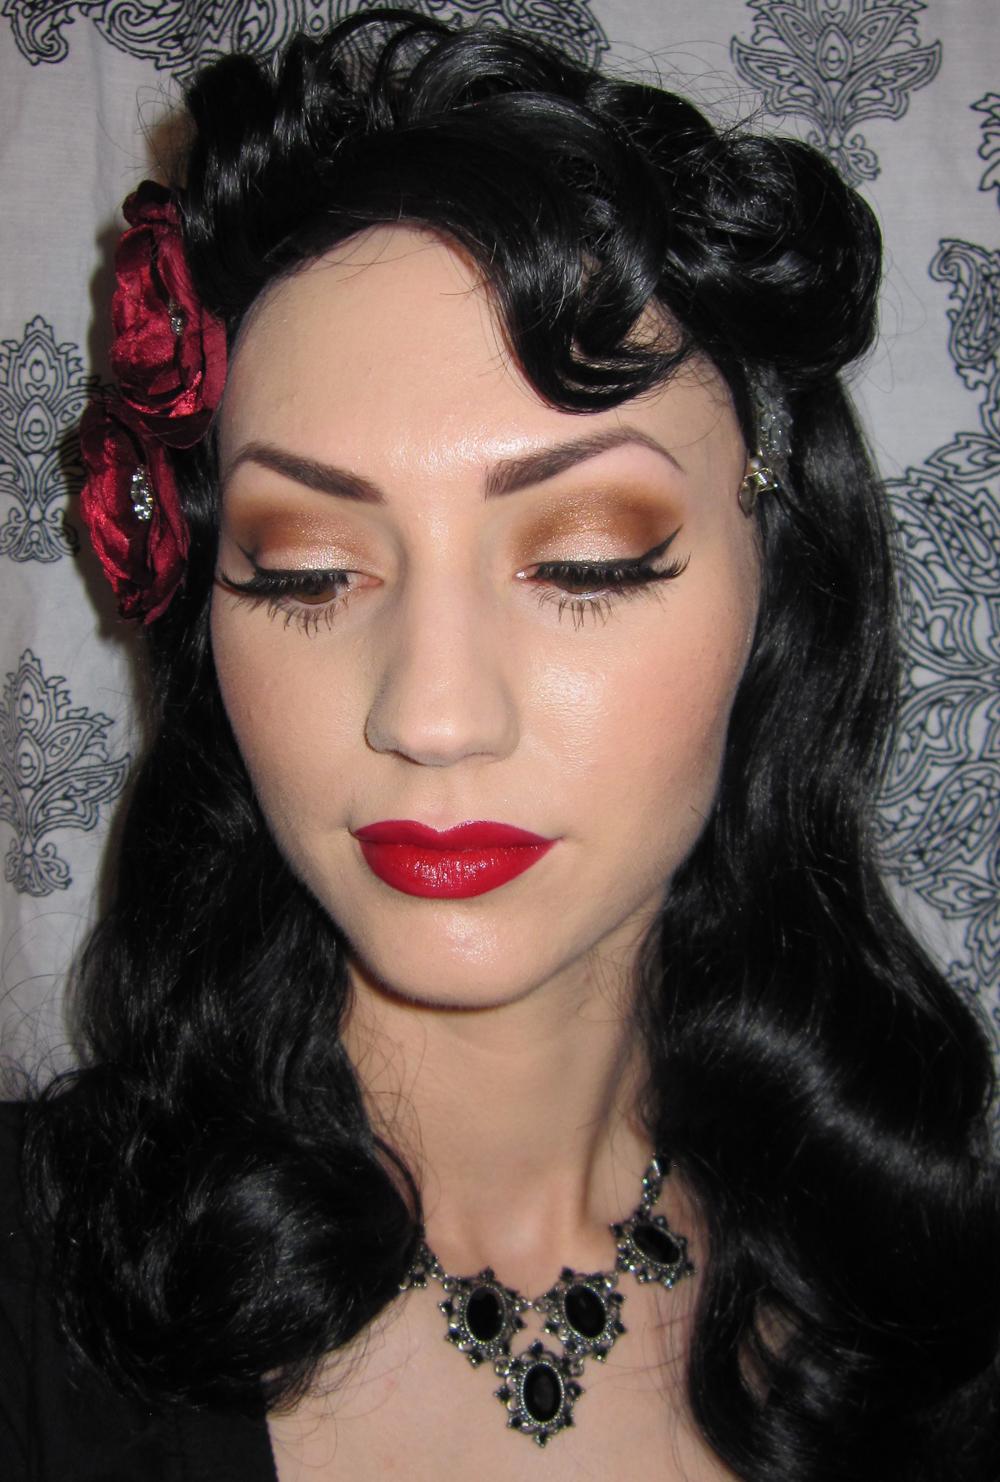 Pin van Luxyhijab op Hijabis Makeup Looks / مكياج المحجبات